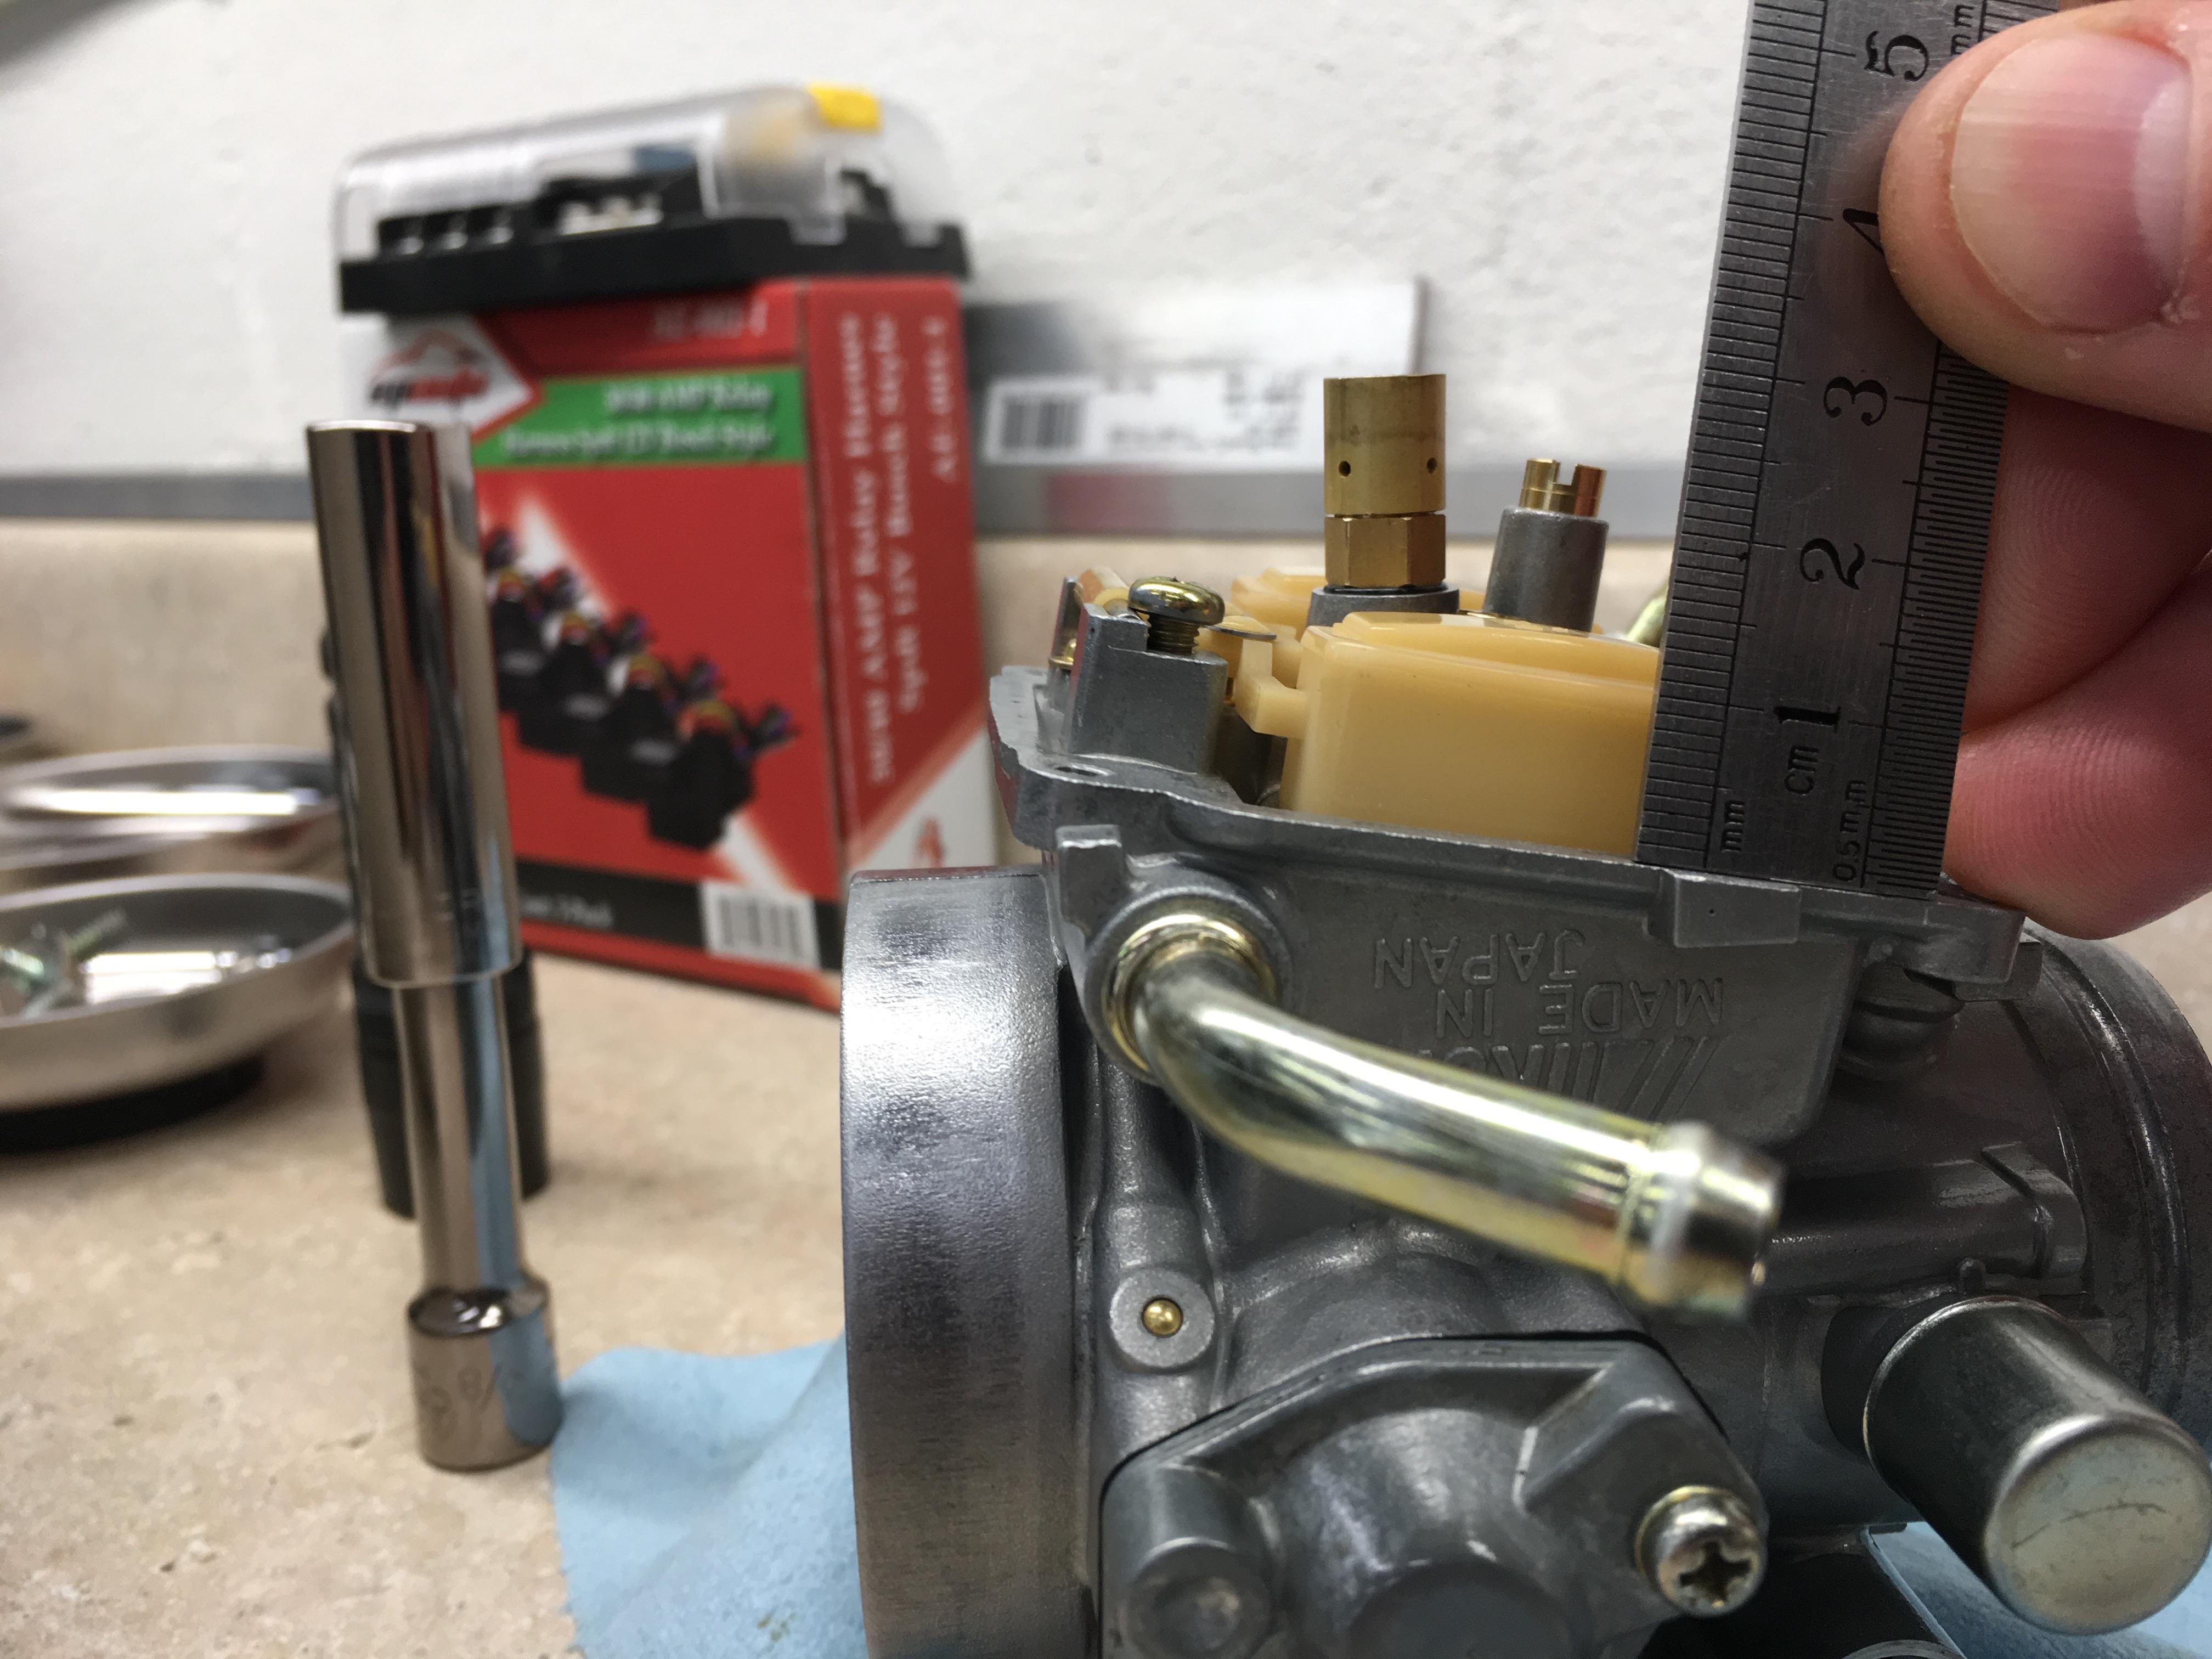 2003 660 carb tuning? - Yamaha Grizzly ATV Forum